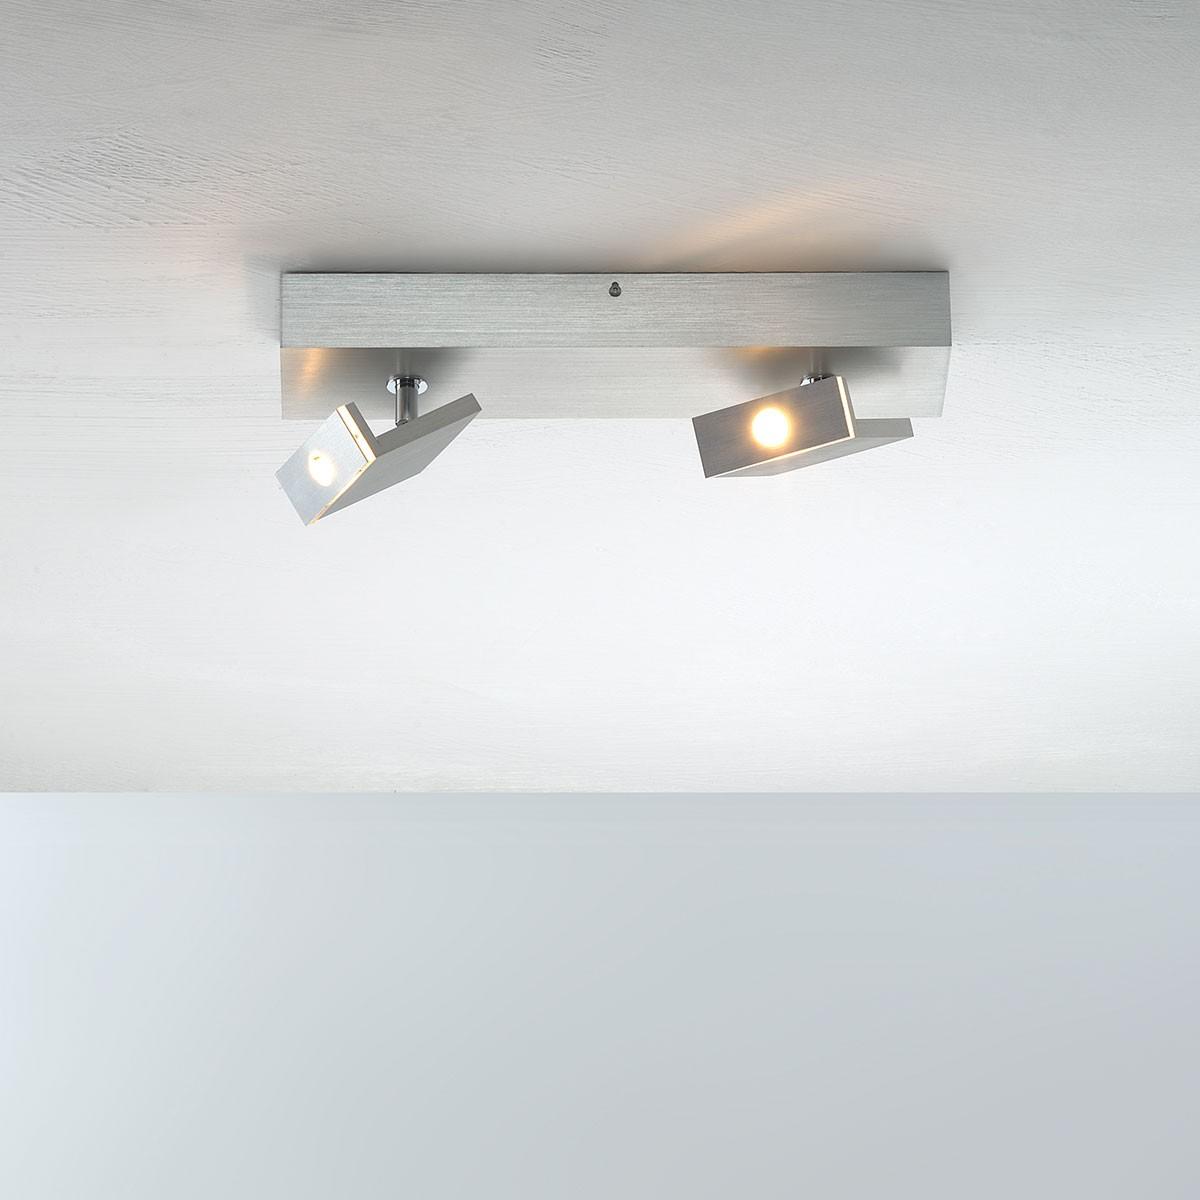 Bopp Elle LED Deckenleuchte, 2-flg., Aluminium geschliffen